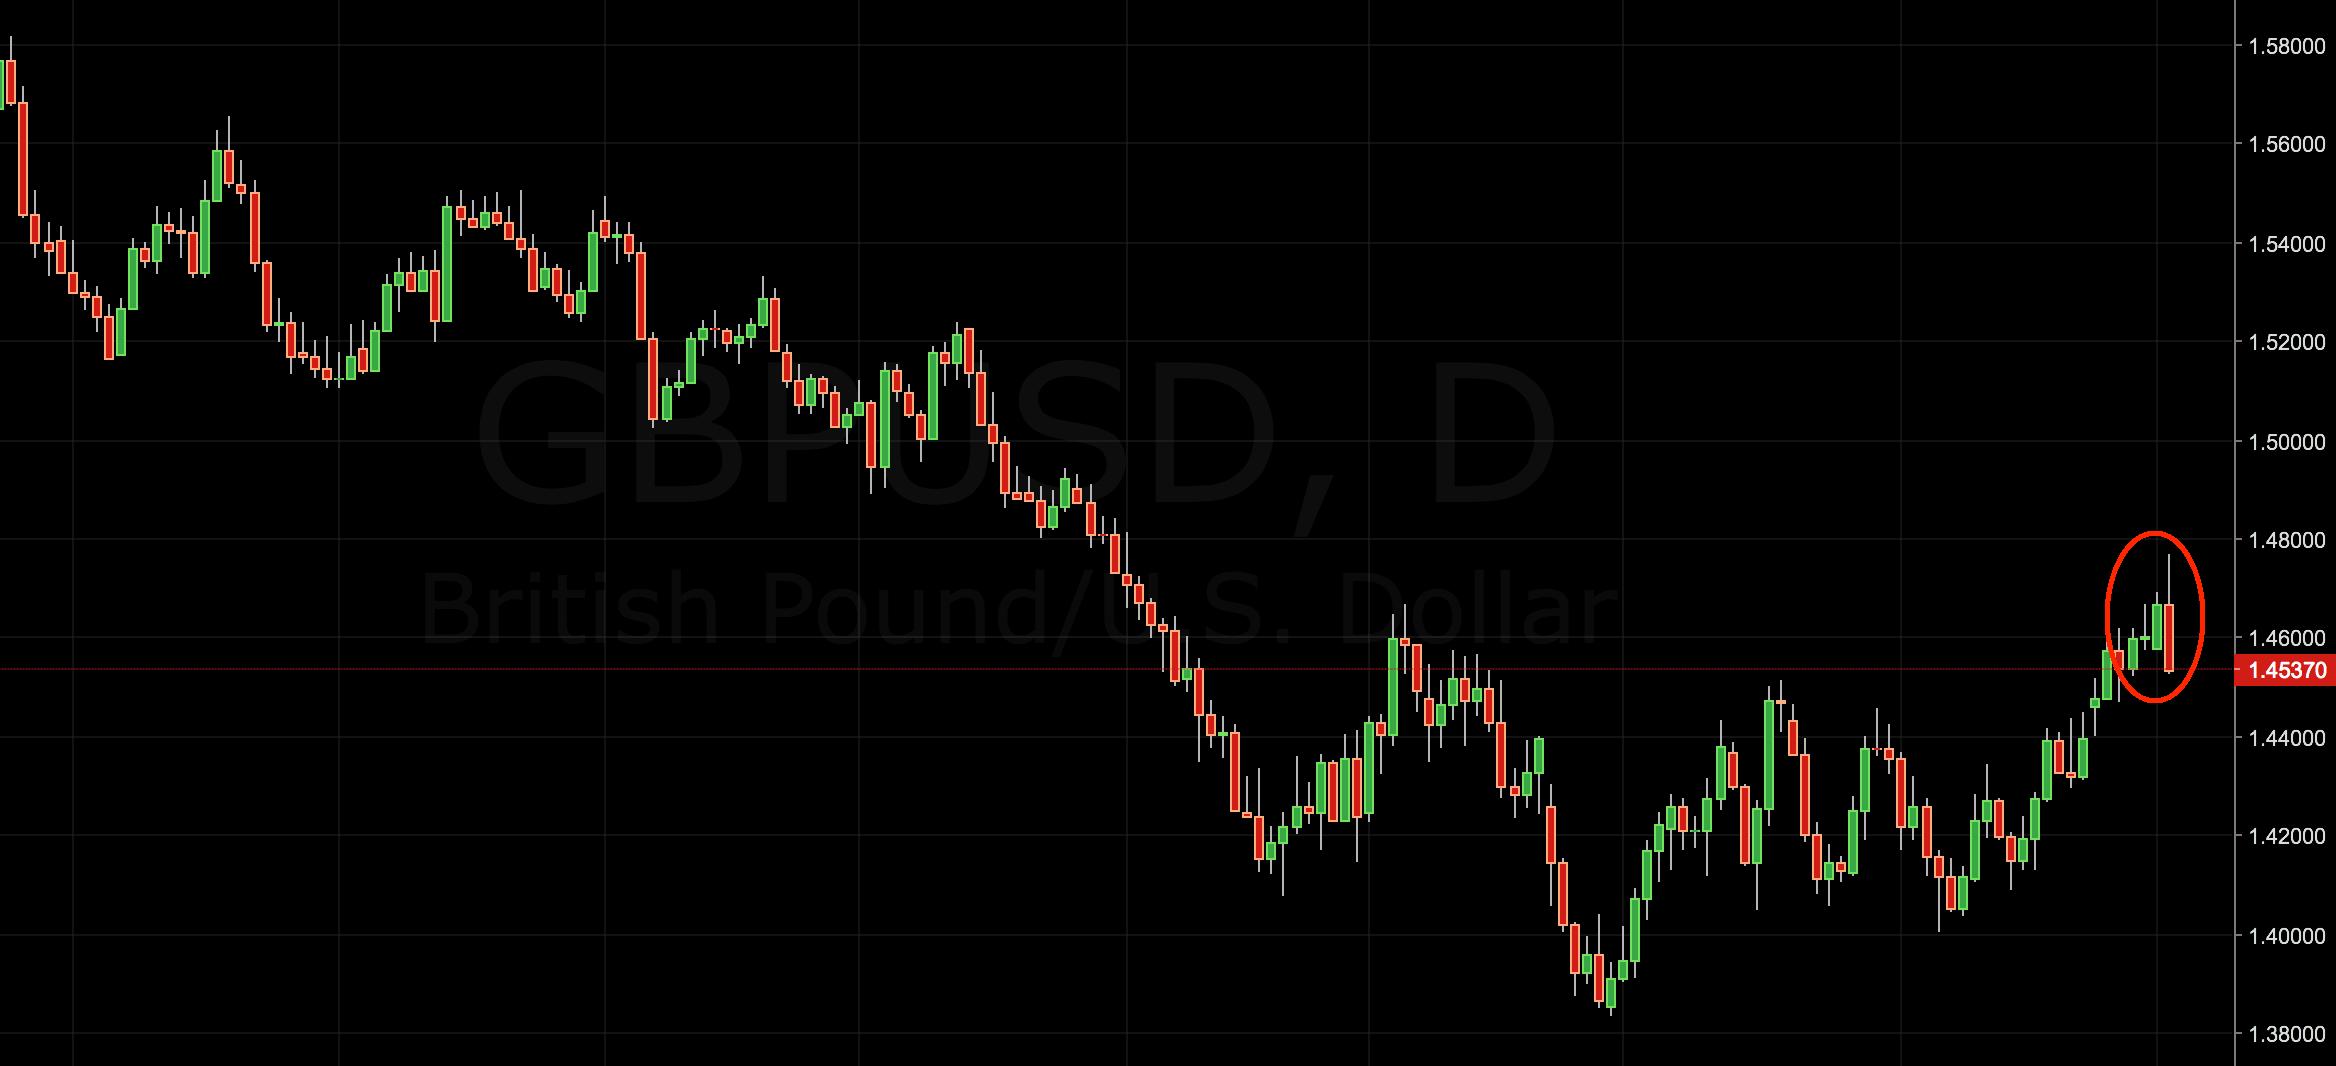 GBP/USD Trading Signal